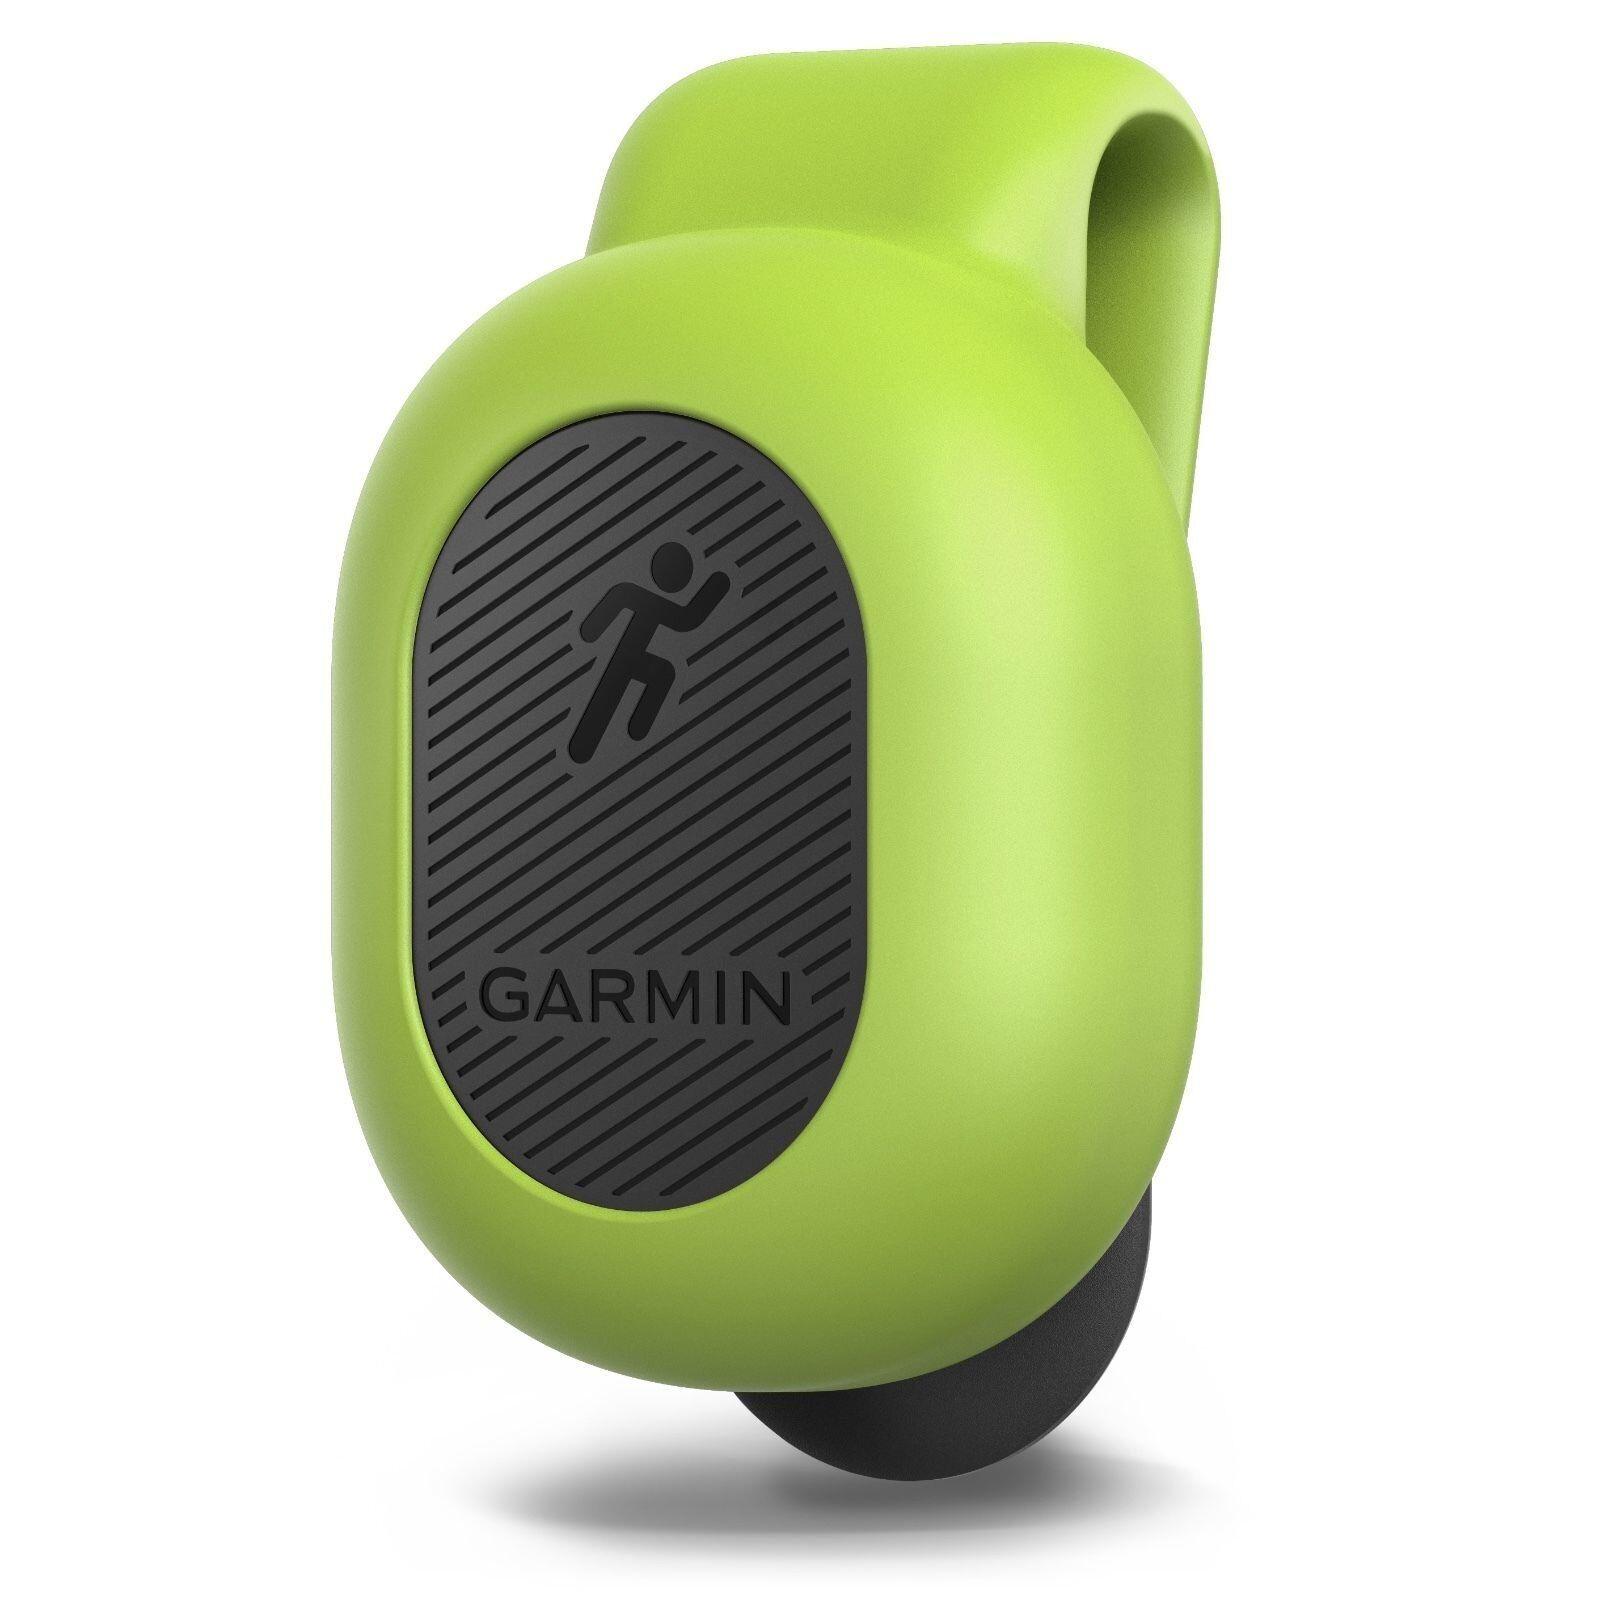 Garmin Running Dynamics Pod Fenix 5, Forerunner 735XT/935, Chronos 010-12520-00